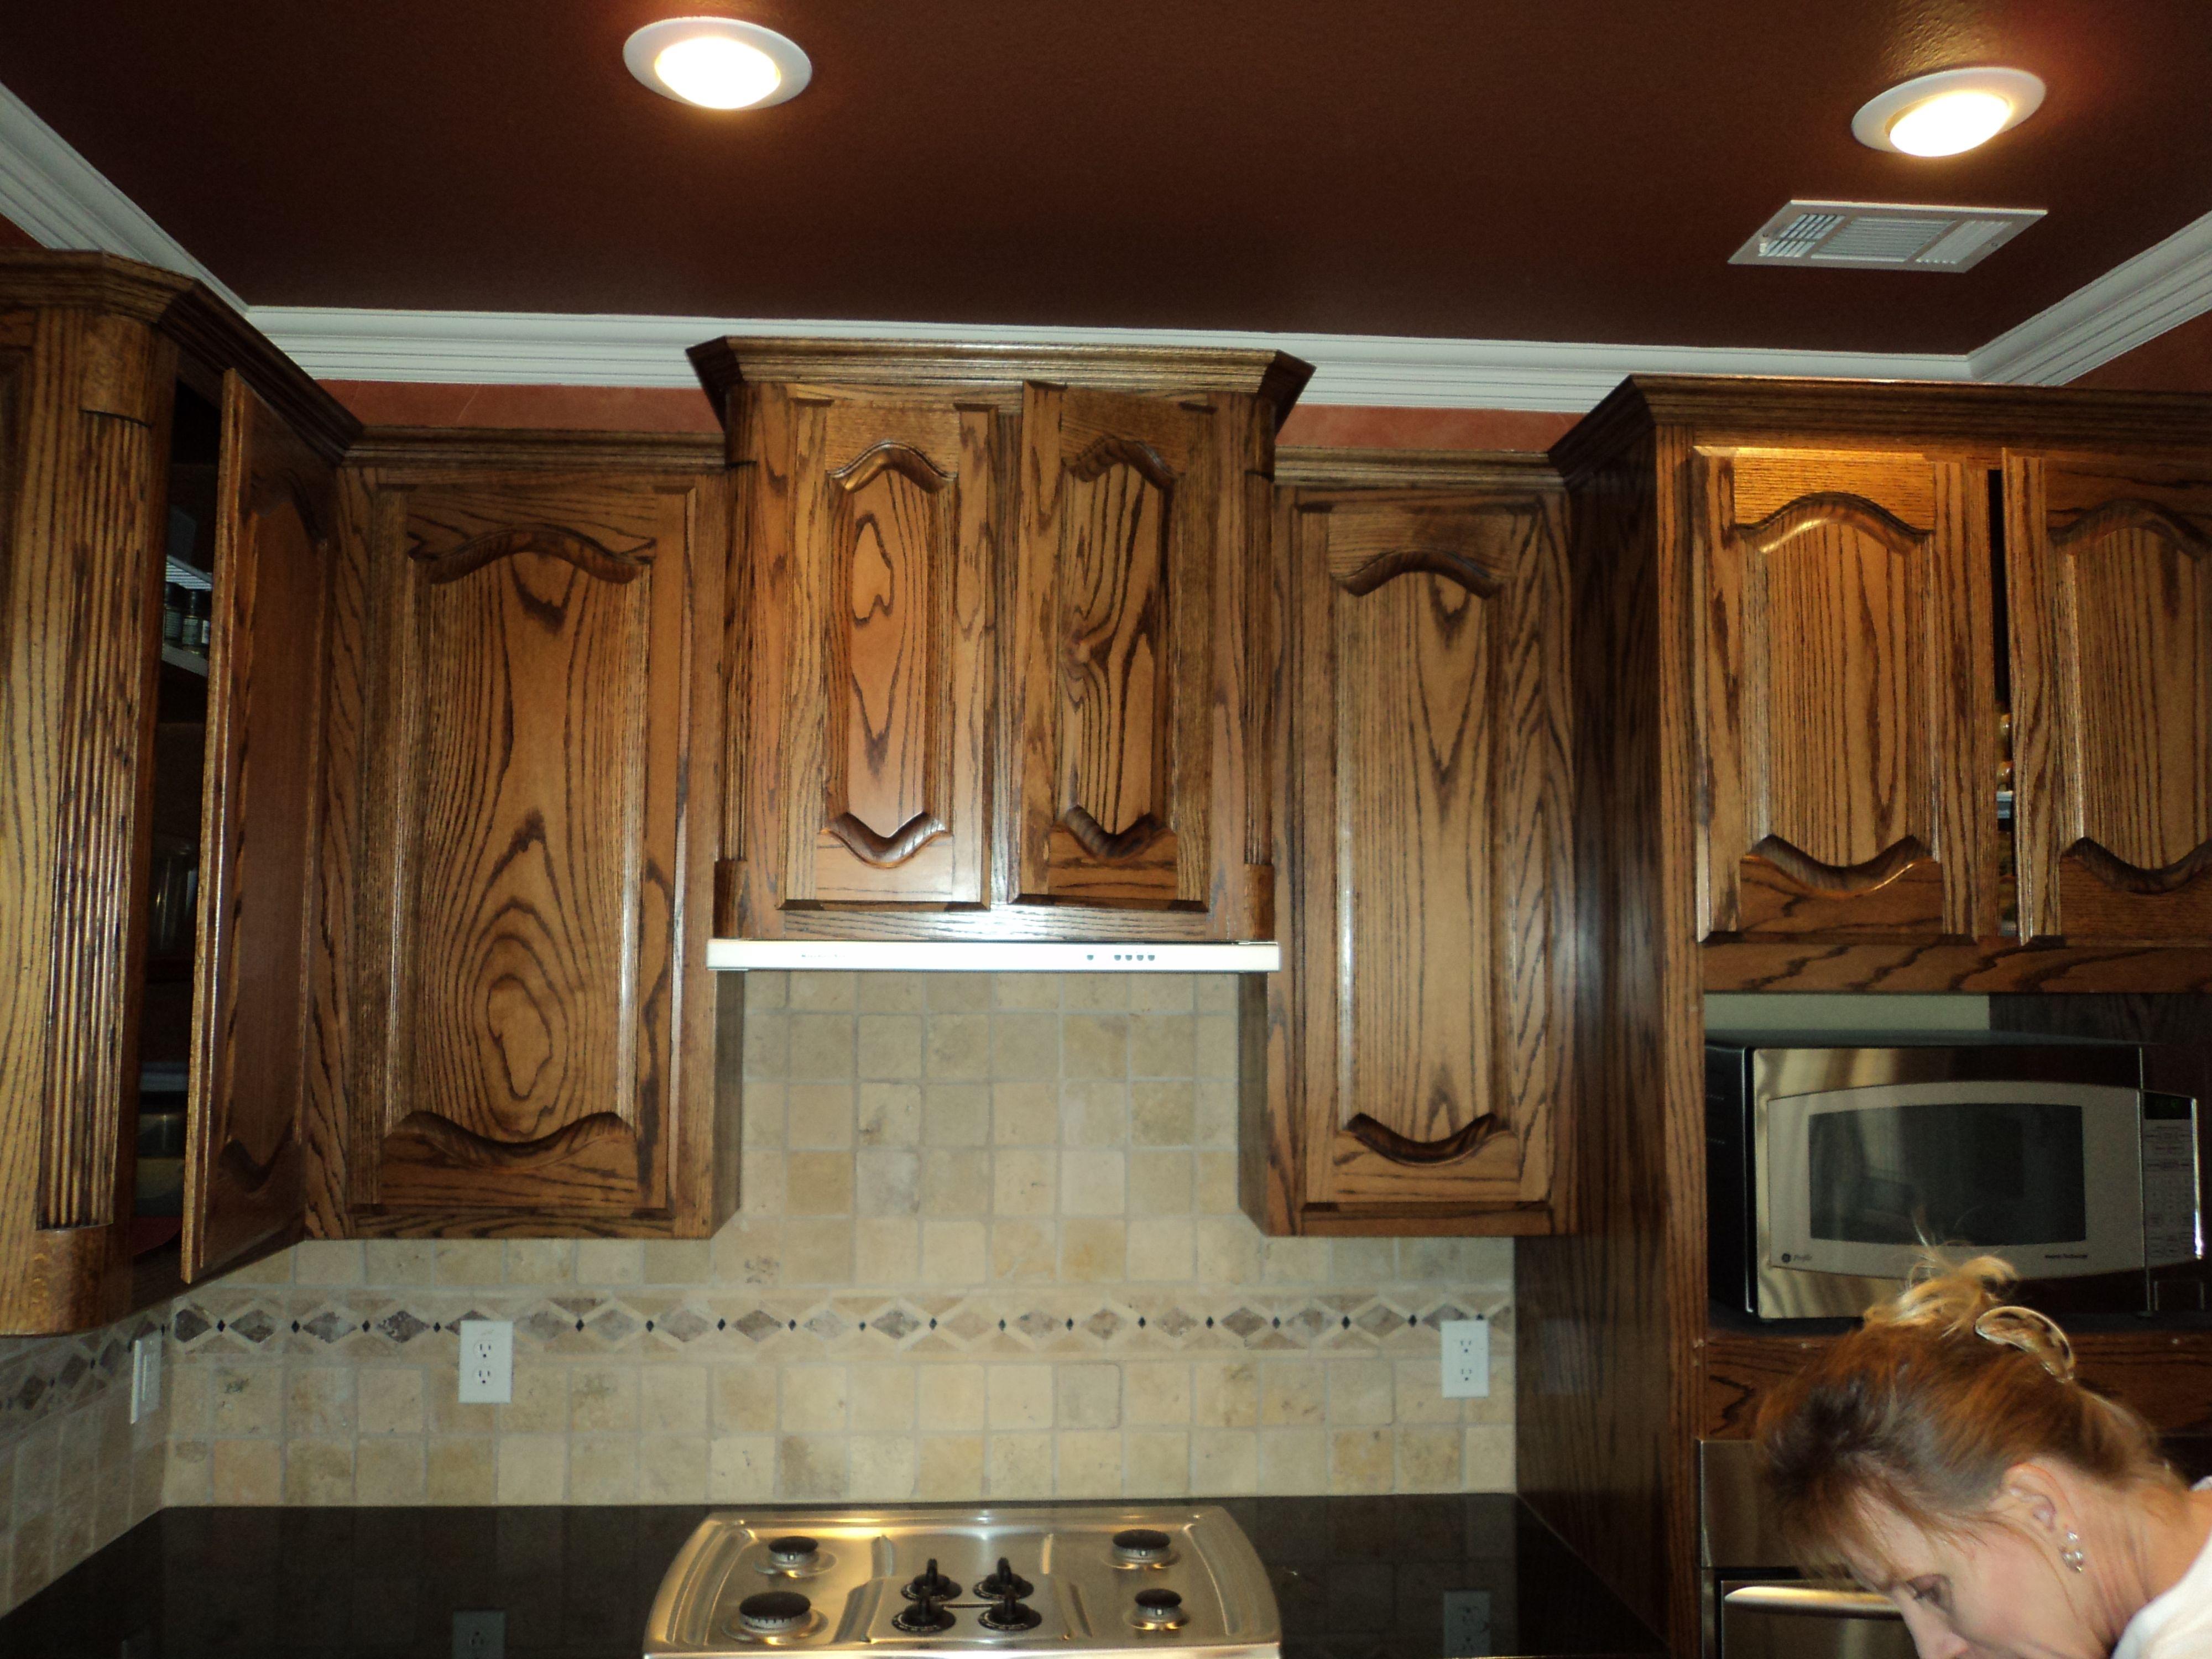 Dark Stained Oak Cabinets In An